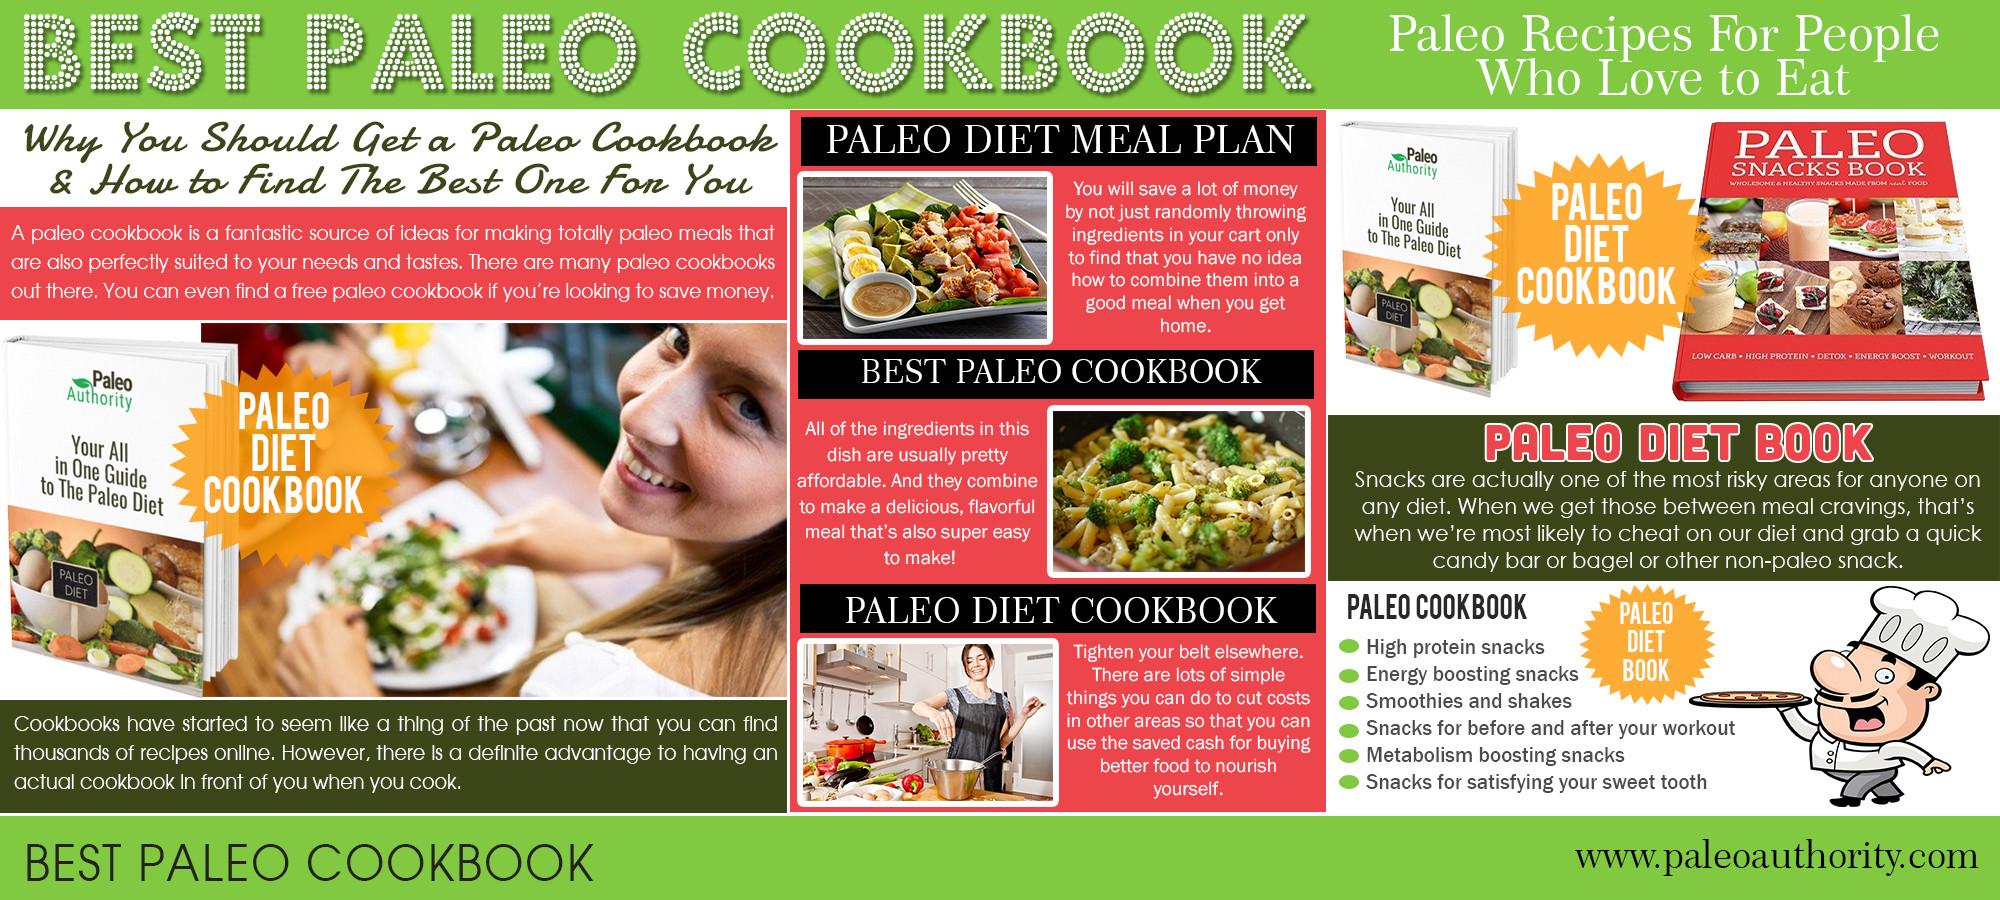 Paleo Diet Wiki  File Paleo t cookbook Wikimedia mons